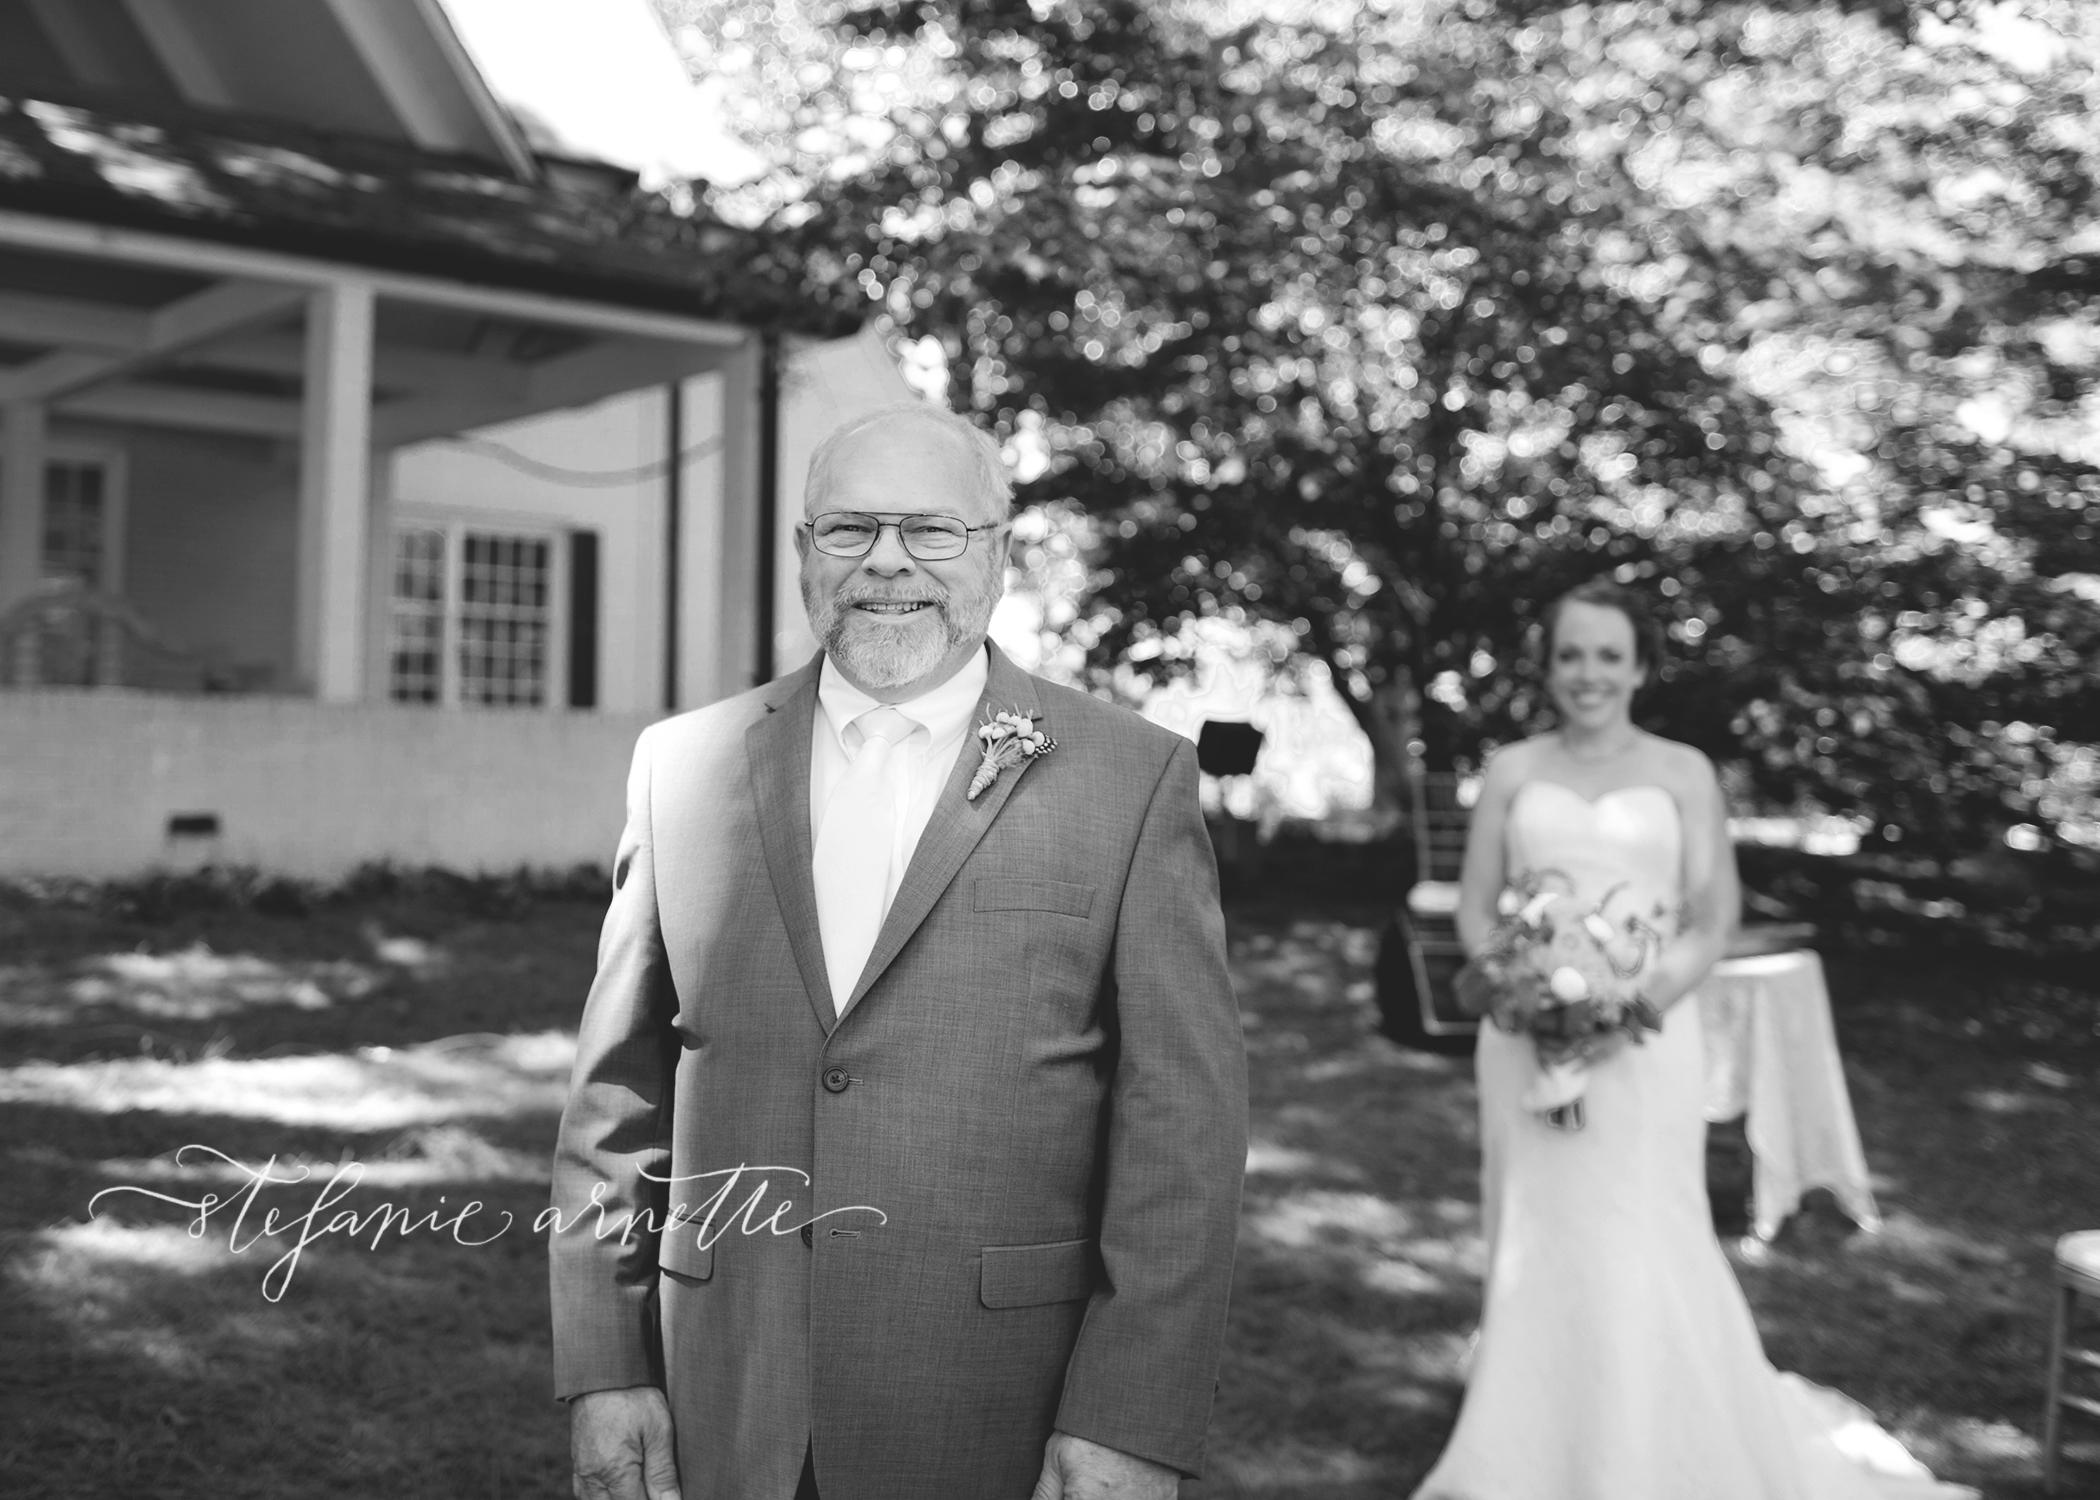 wedding-126bw.jpg